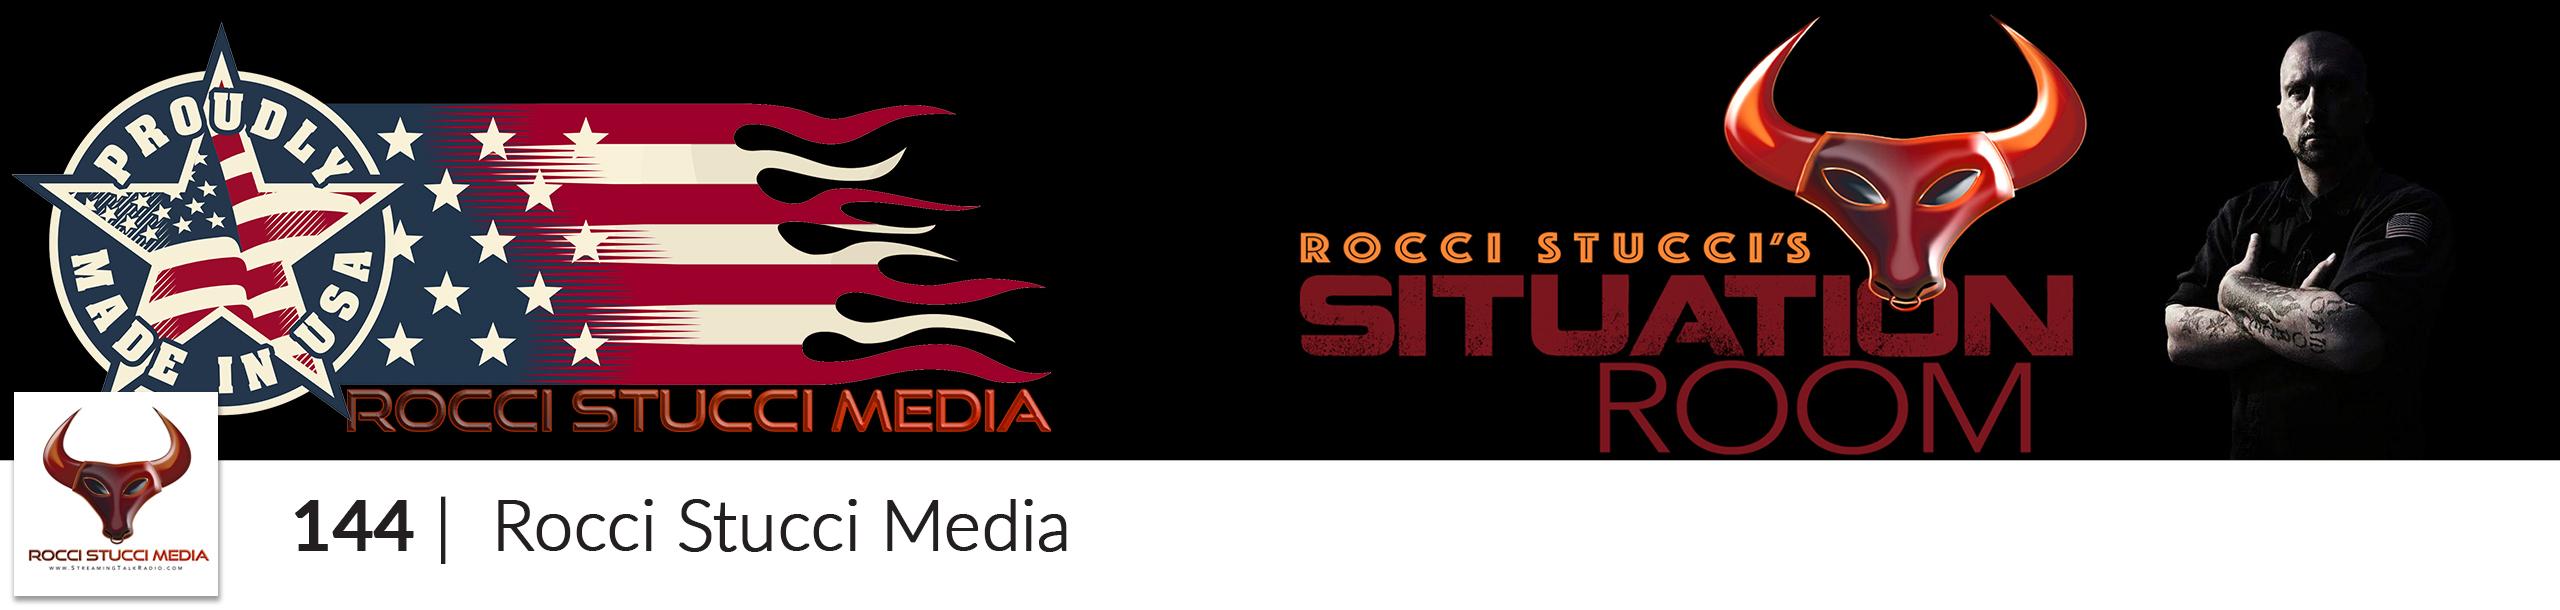 RocciStucciMedia_header1